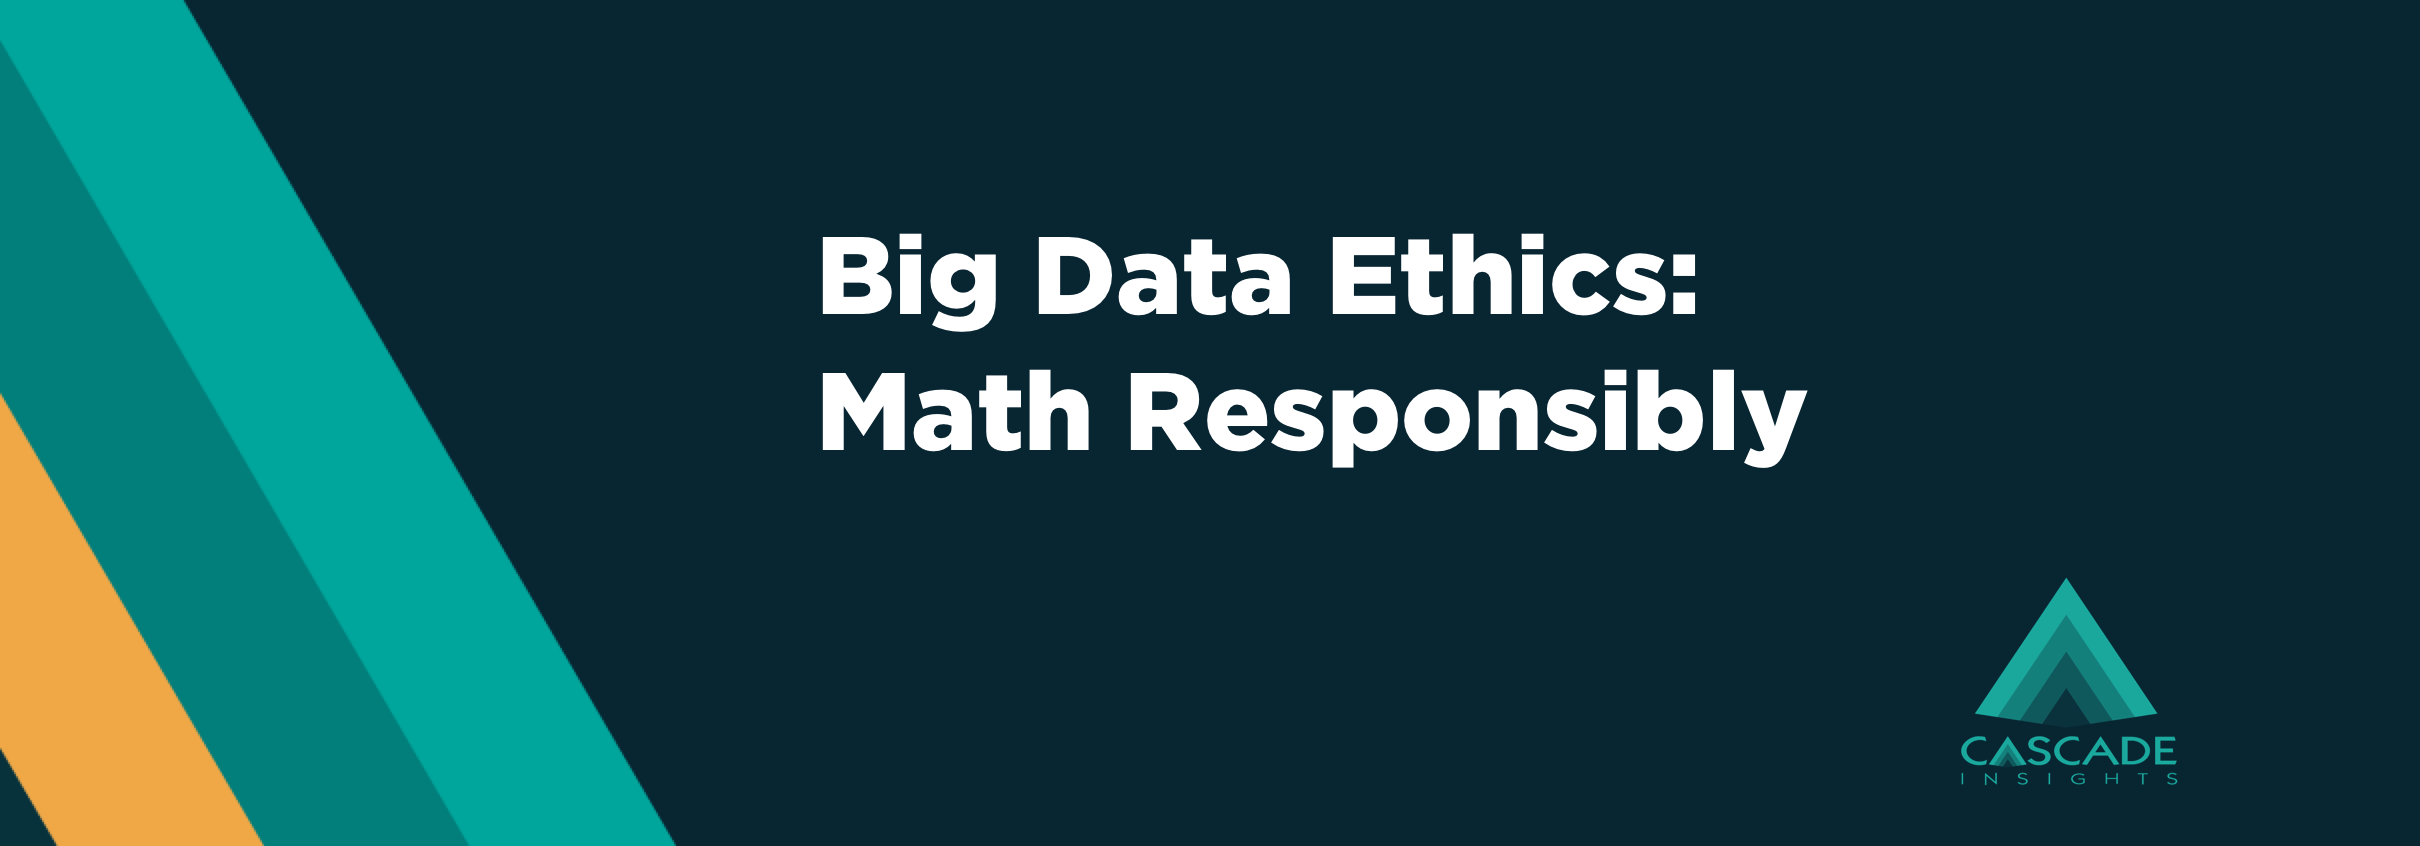 Big Data Ethics: Math Responsibly